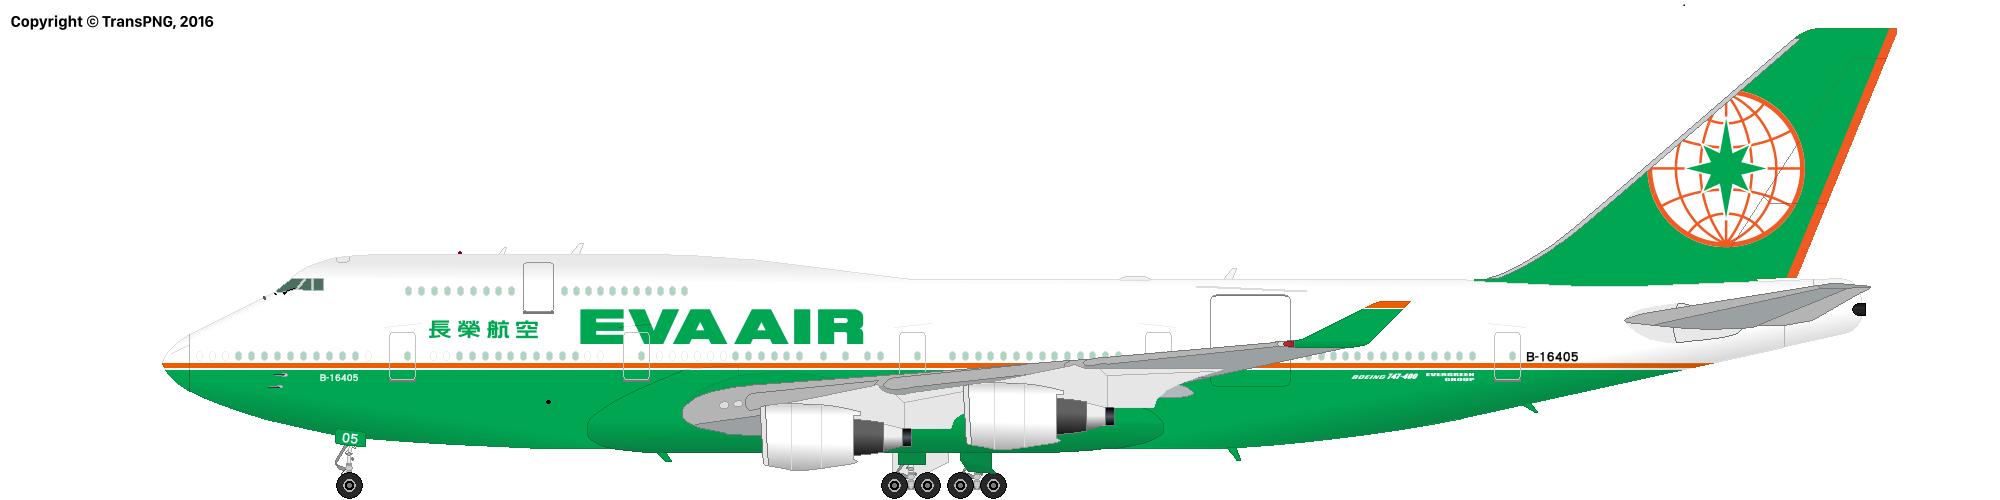 Airplane 6202